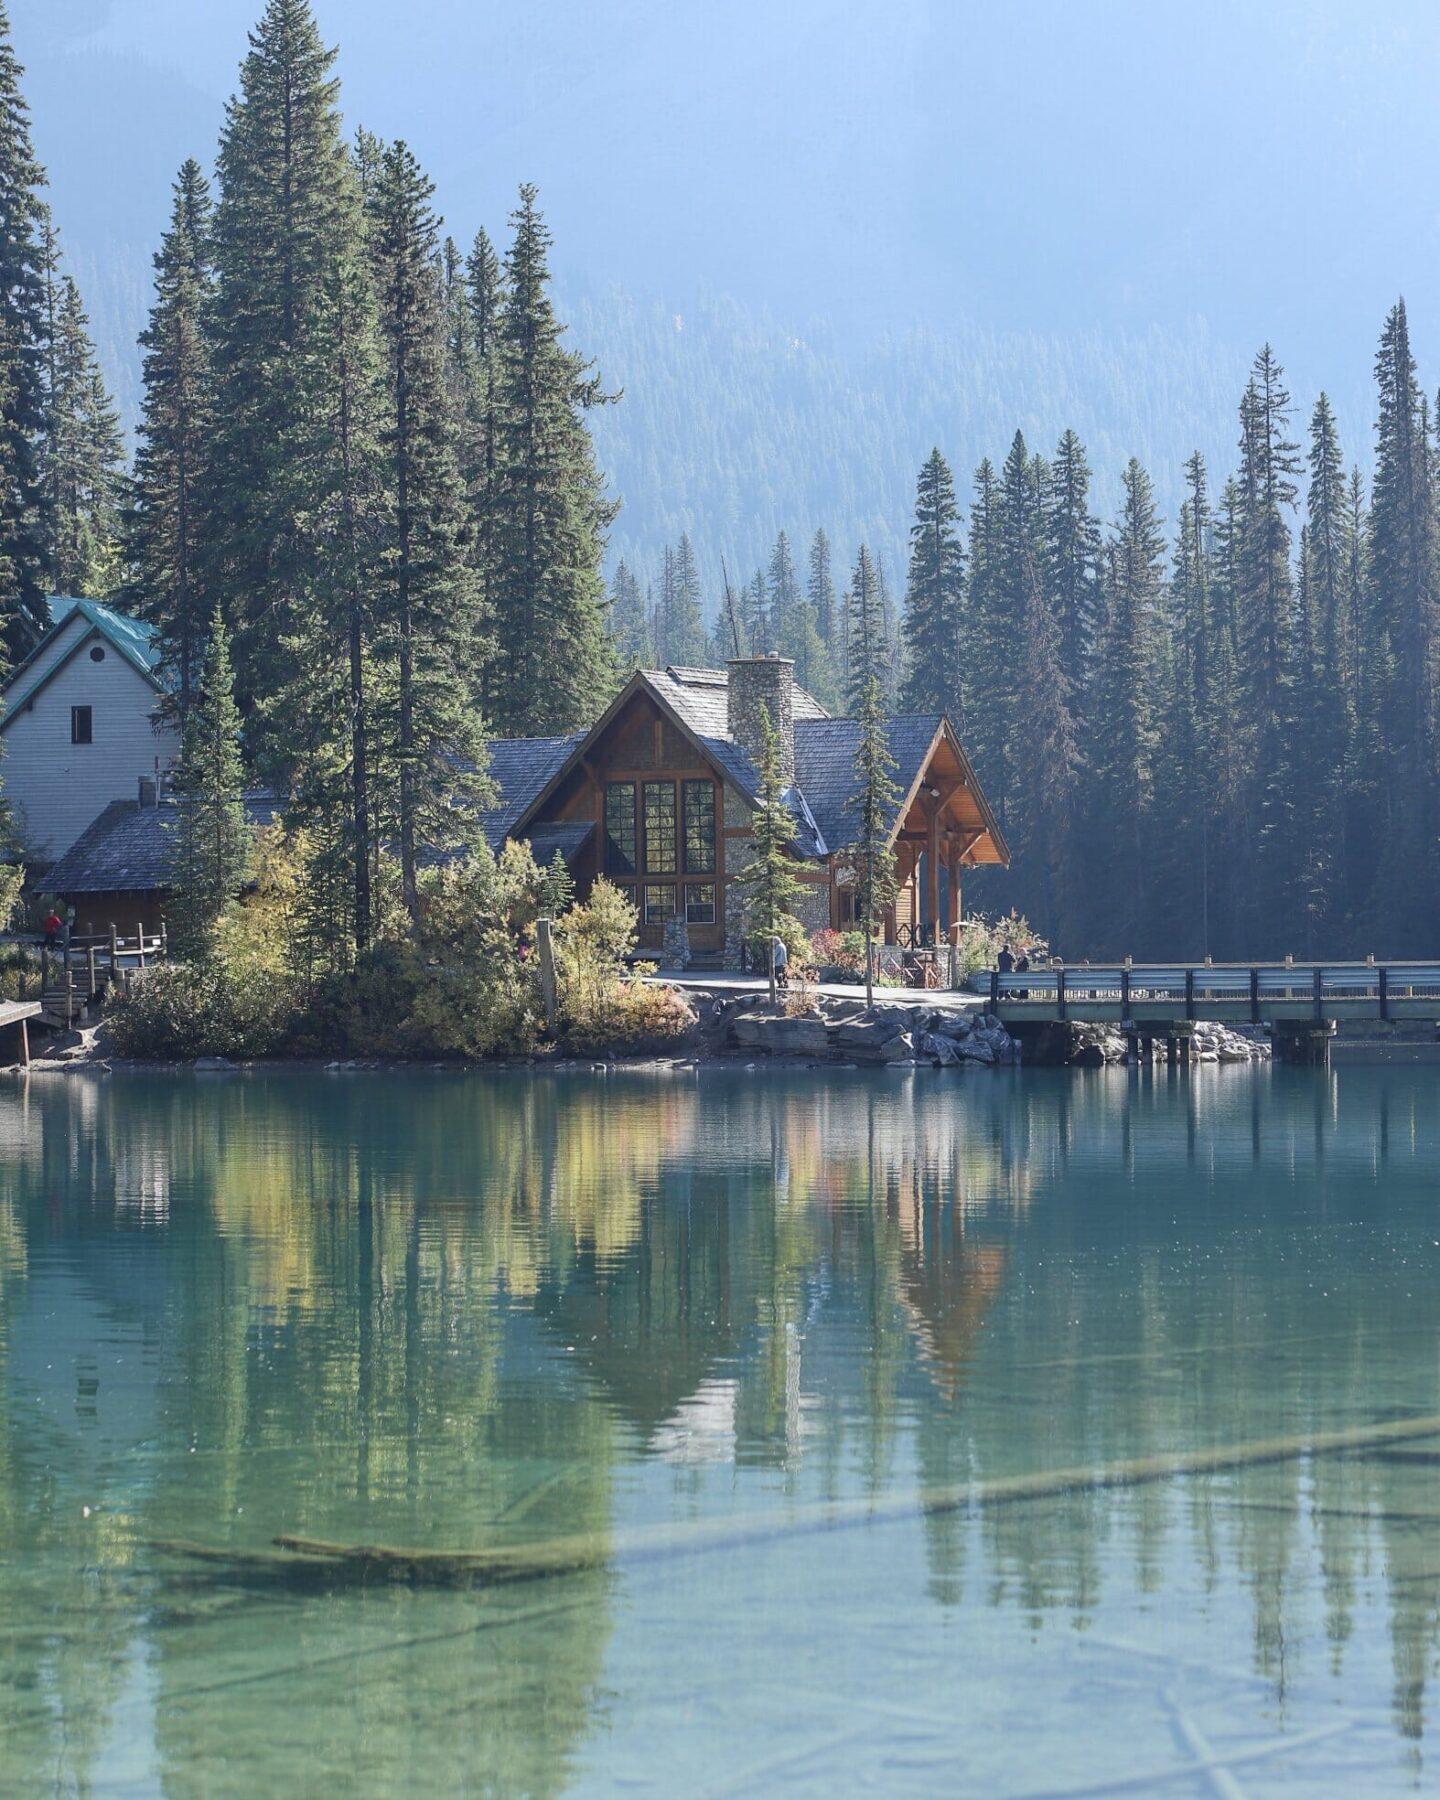 Emerald Lake Canadian Rockies Roadtrip